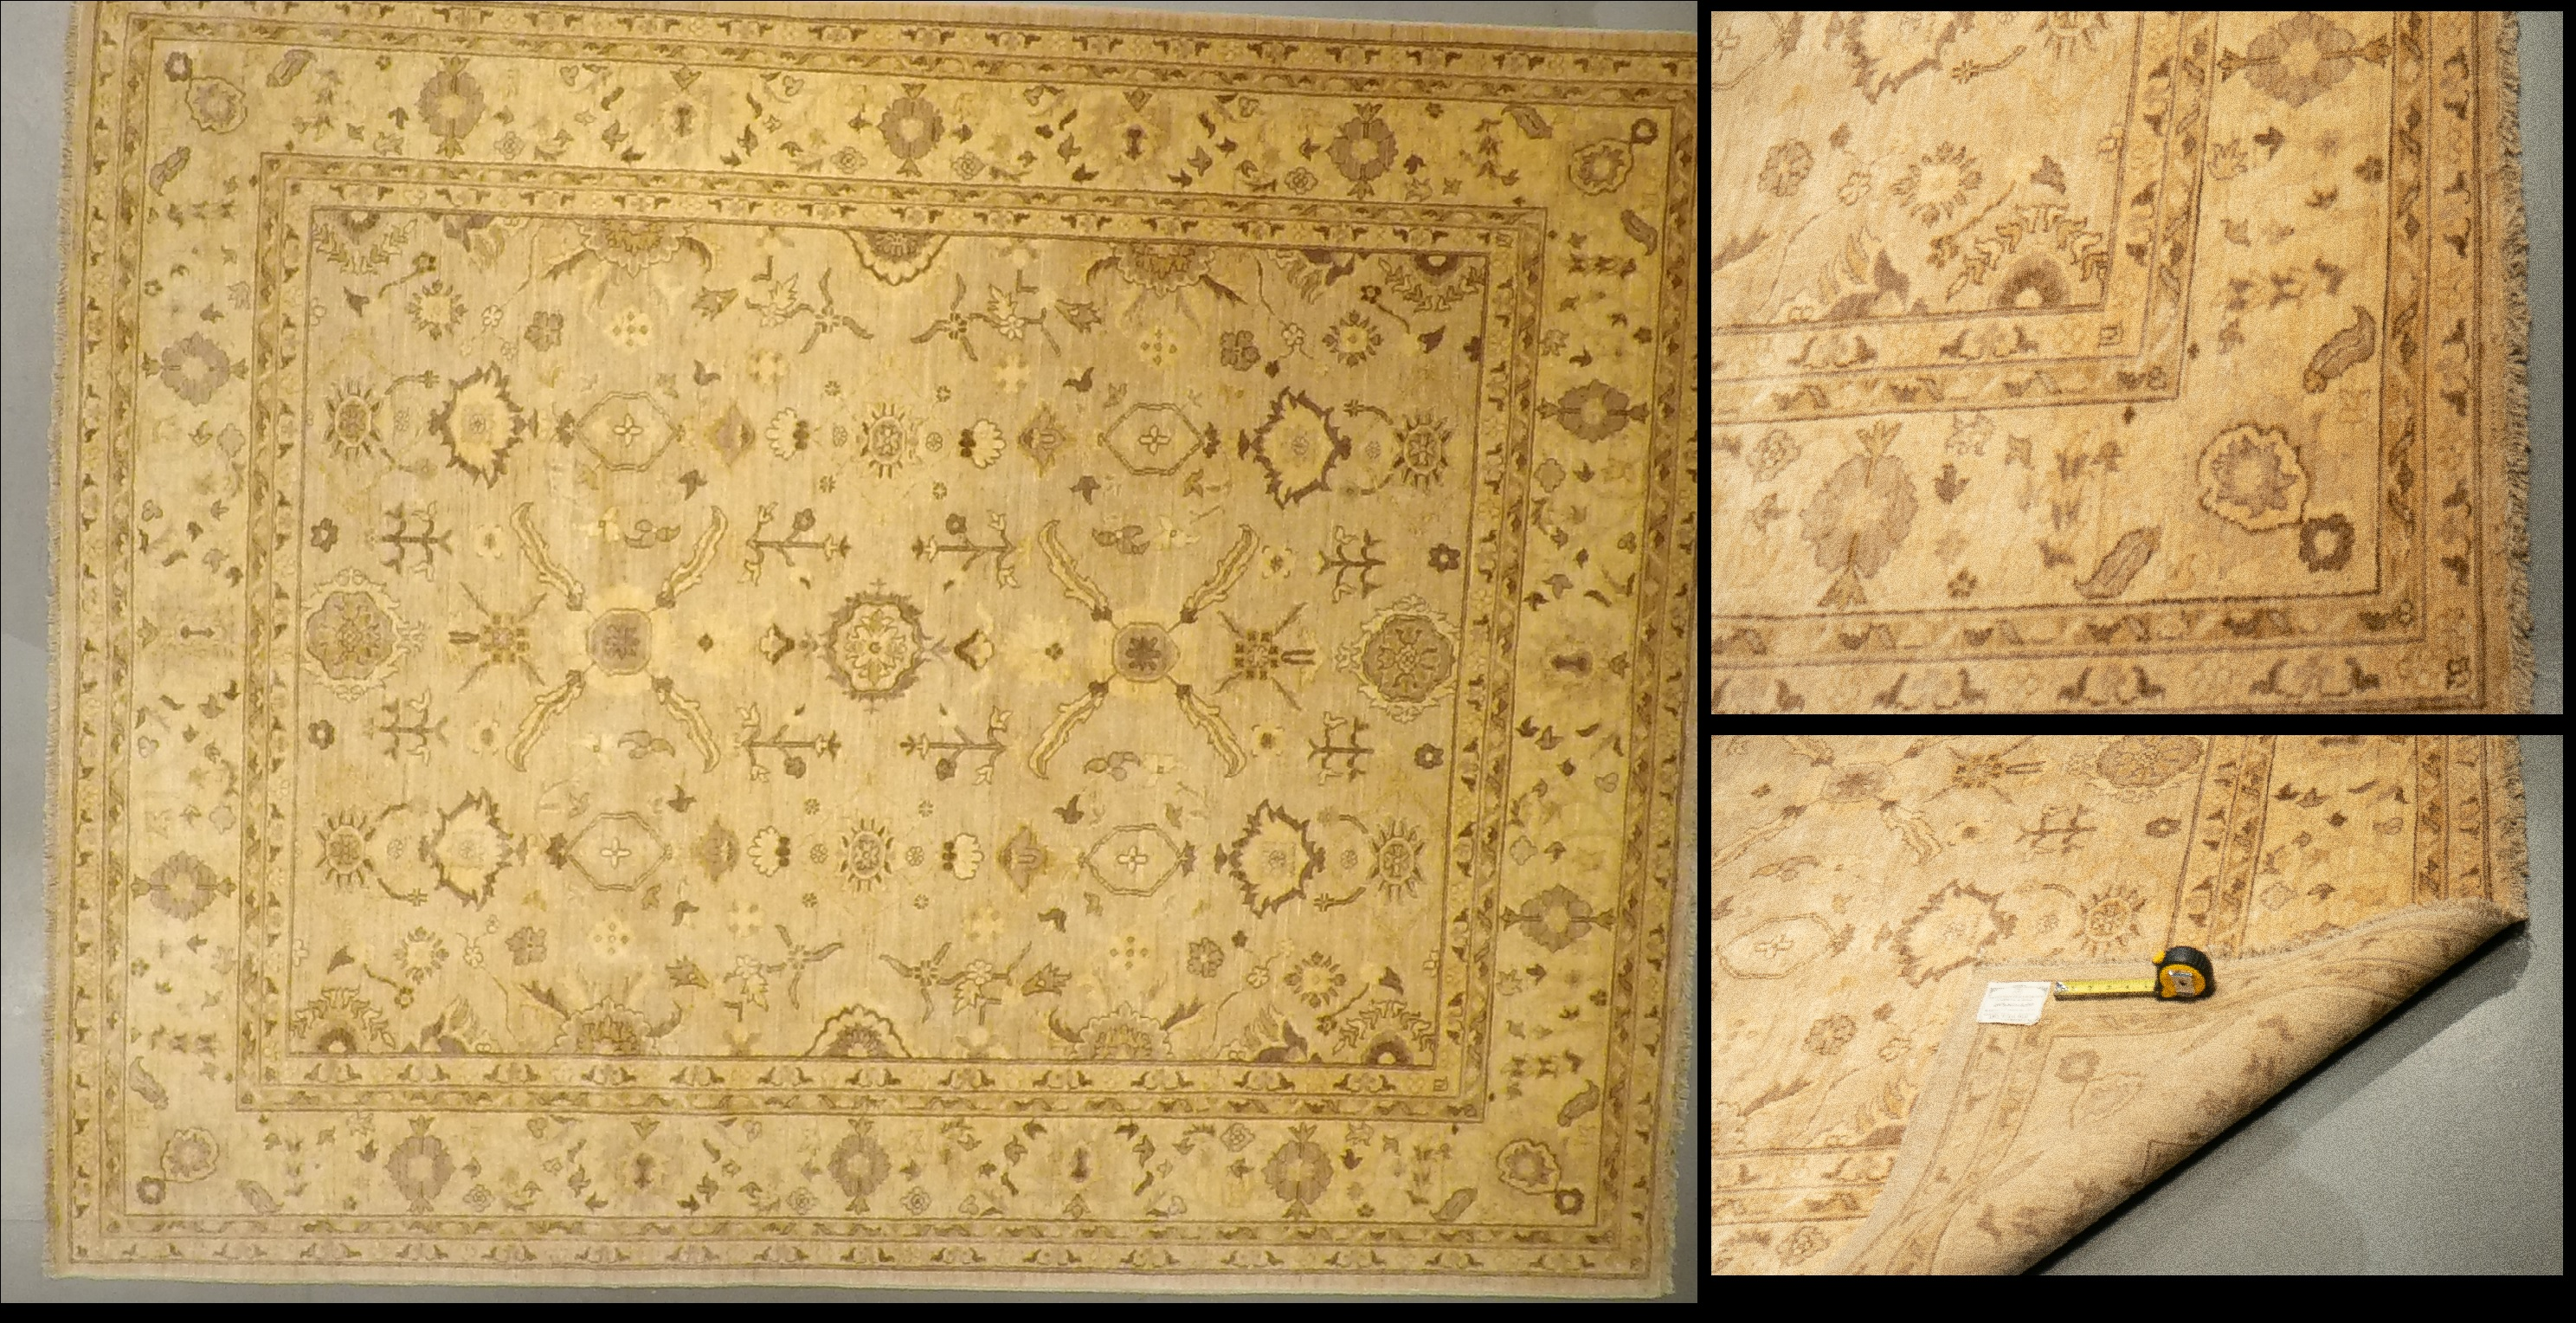 LD 67 3706 (8.3 x 10.3) Wool-Handmad